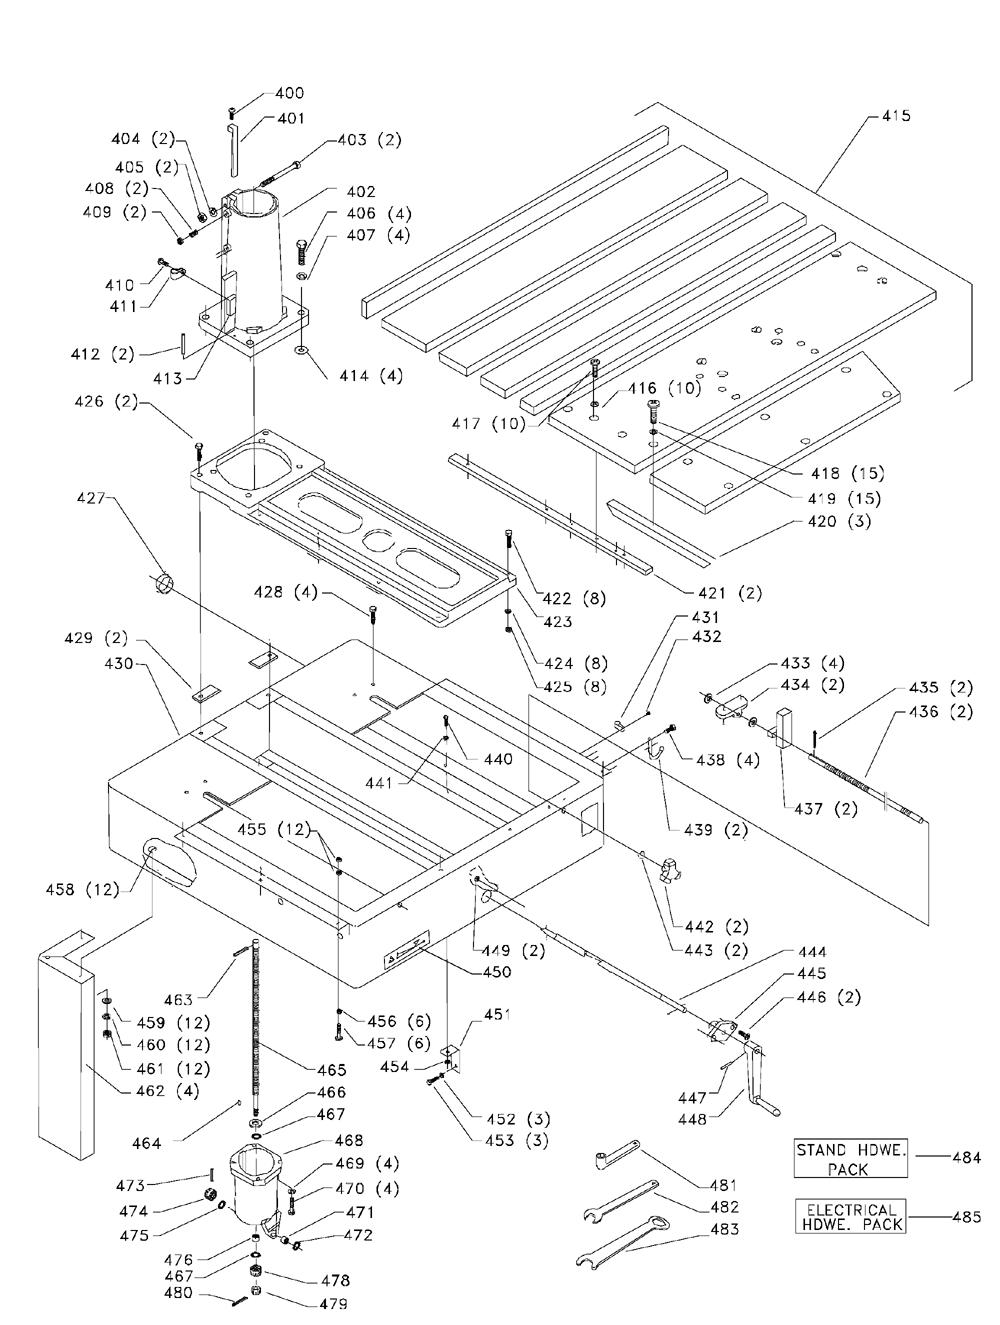 Buy Delta 33-421 Type-1 7 1/2 HP, 18 Inch Radial Arm